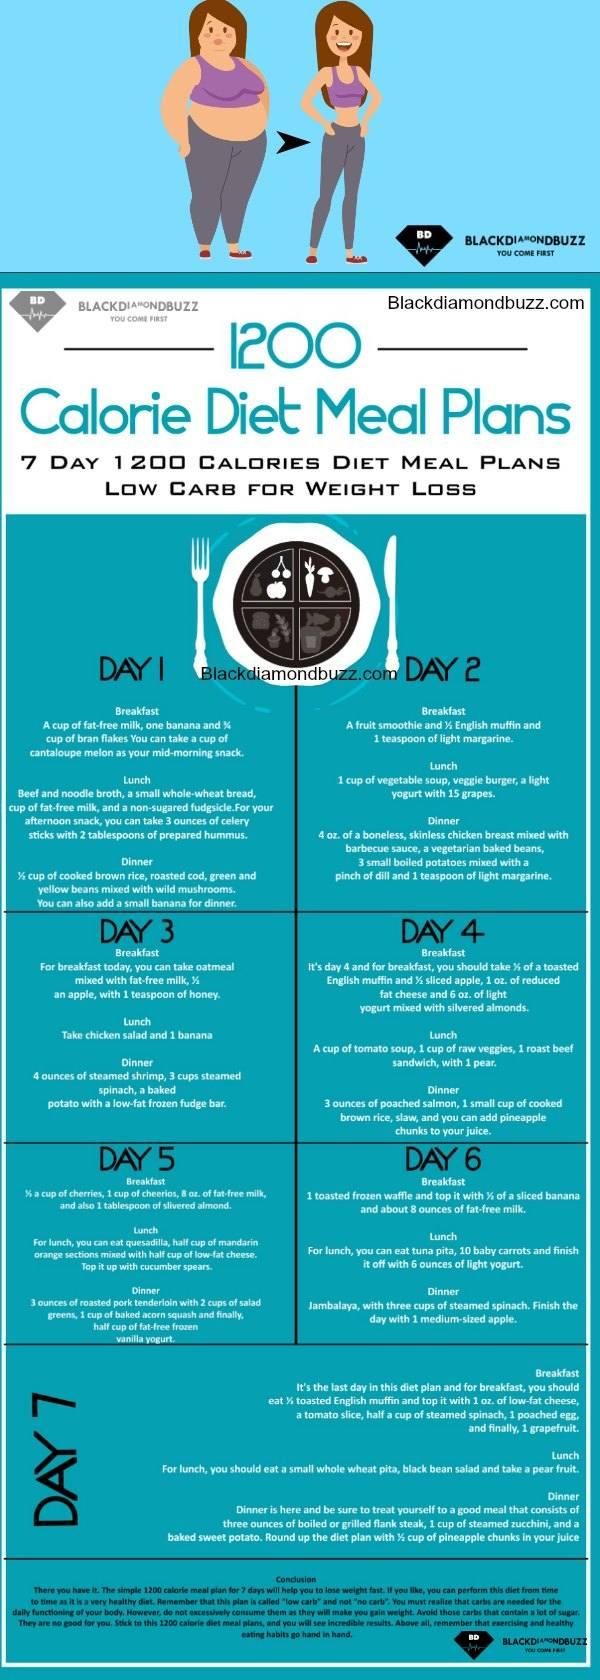 7 day 1200 calorie diet